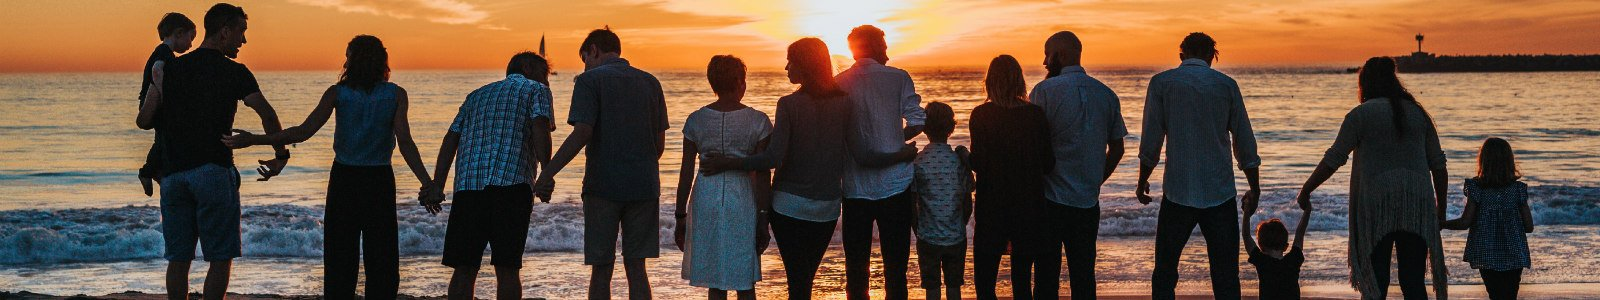 Familie op het strand, foto: Tyler Nix, via Unsplash